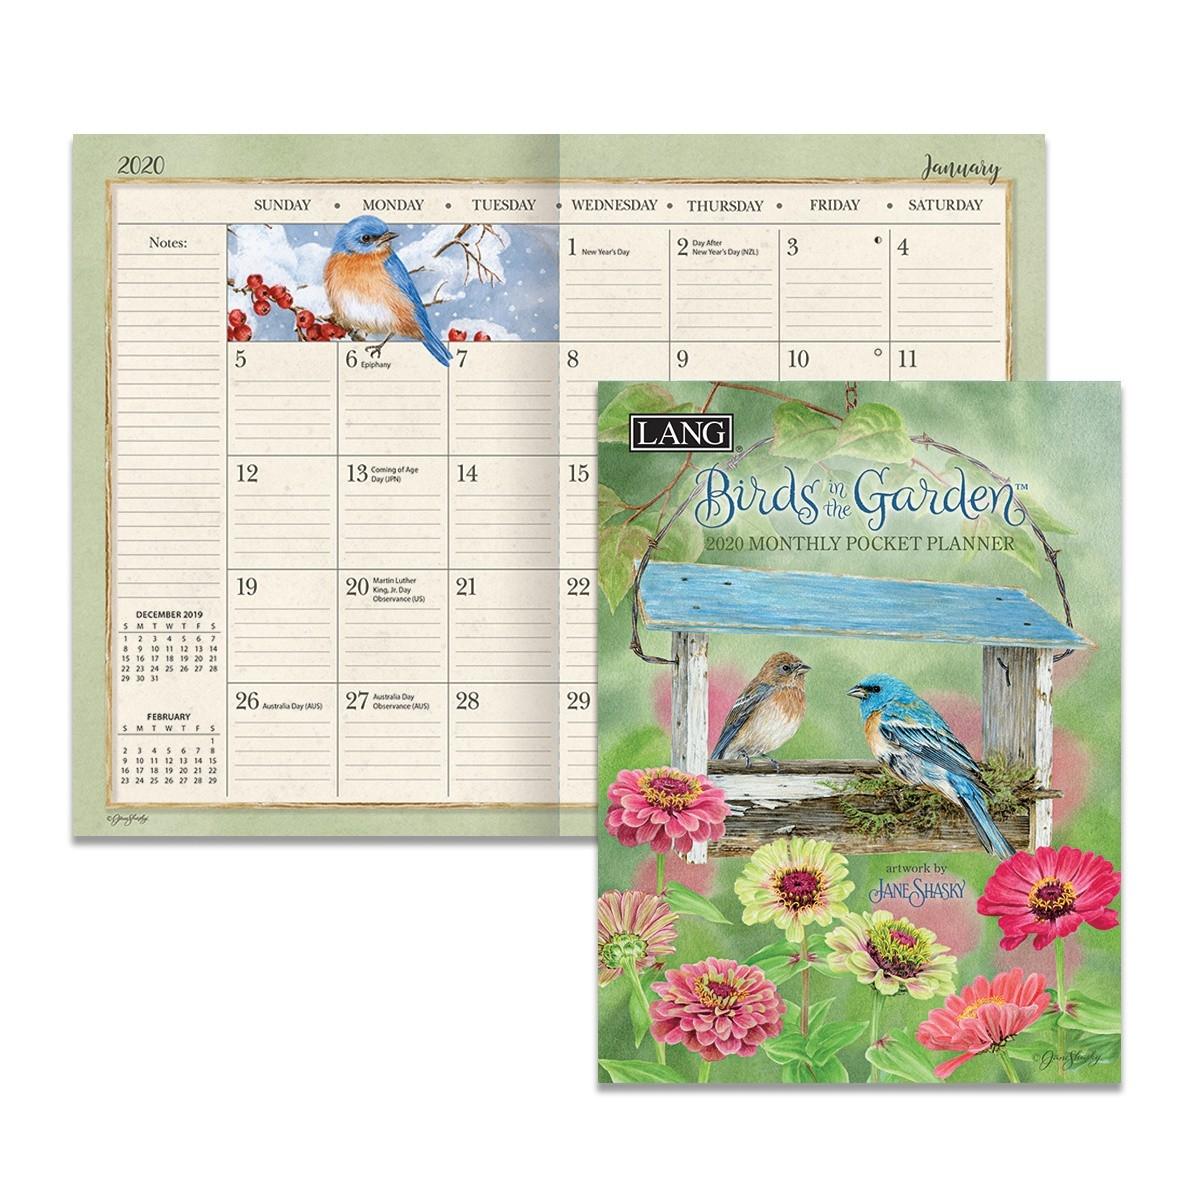 Birds In The Garden 2020 Monthly Pocket Planner  Monthly Pocket Planner 2020 2020